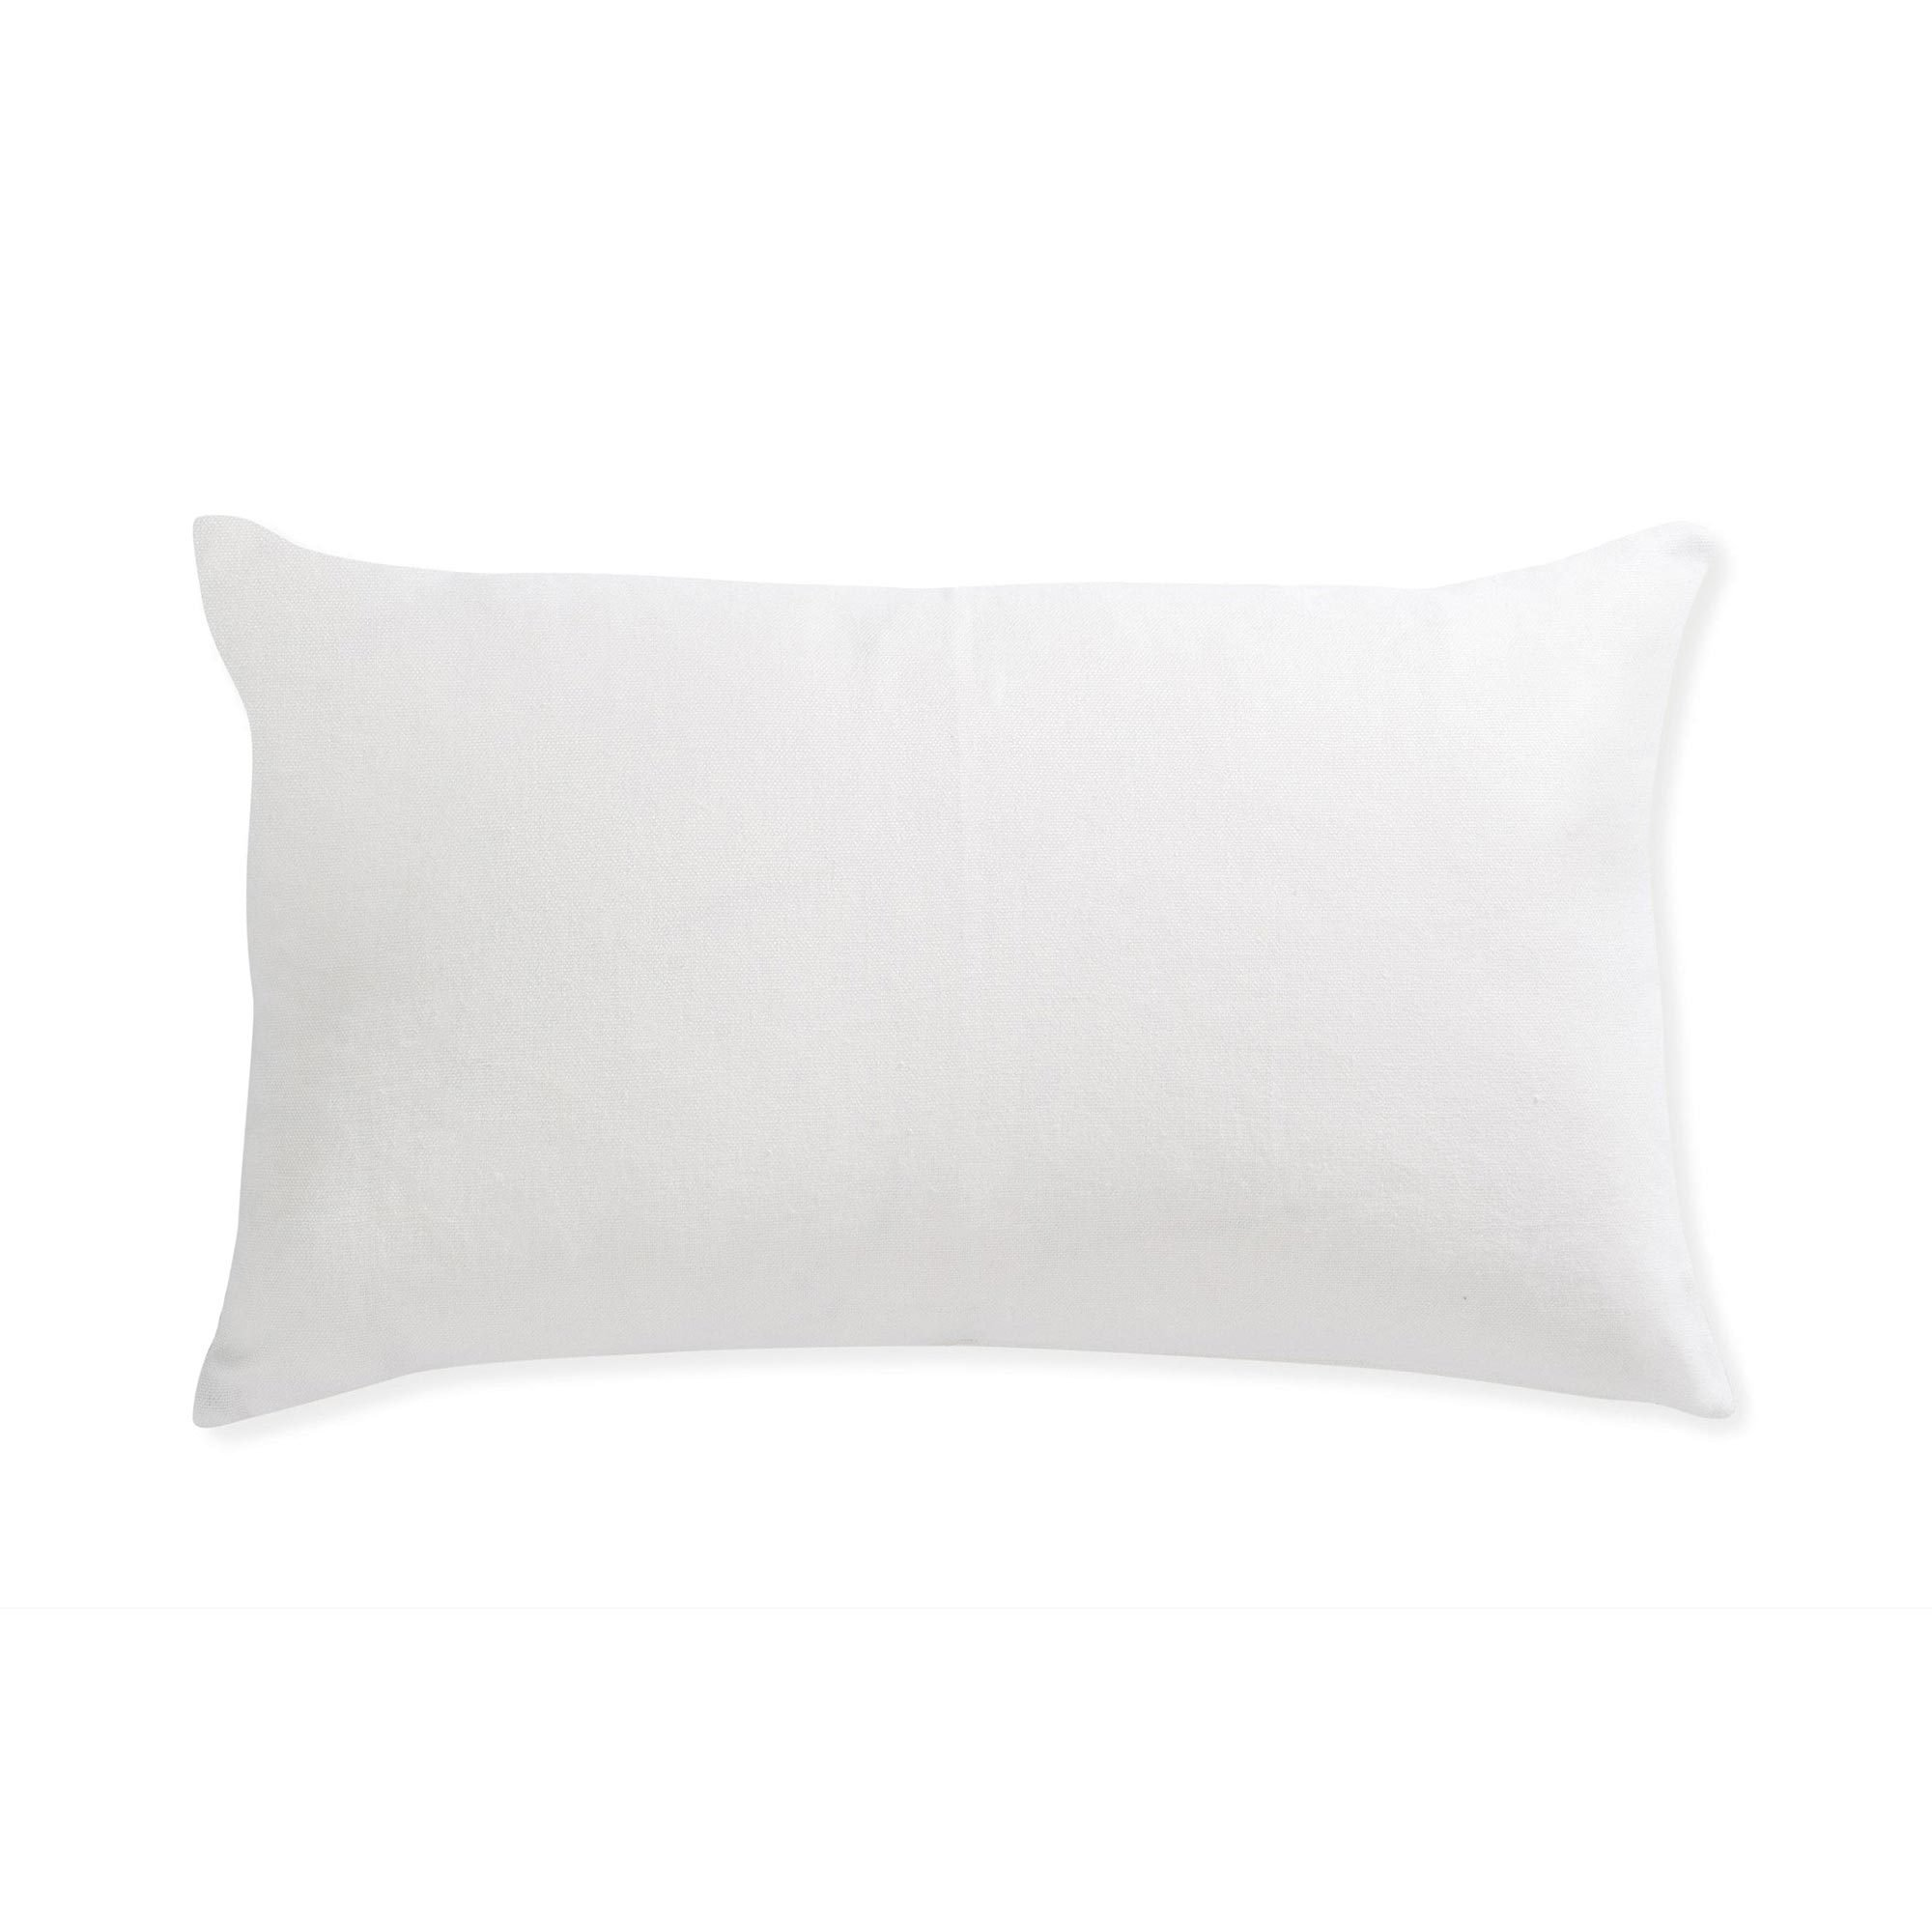 Luxury Hotel Quality Goose Down Alternative Lumbar Pillow